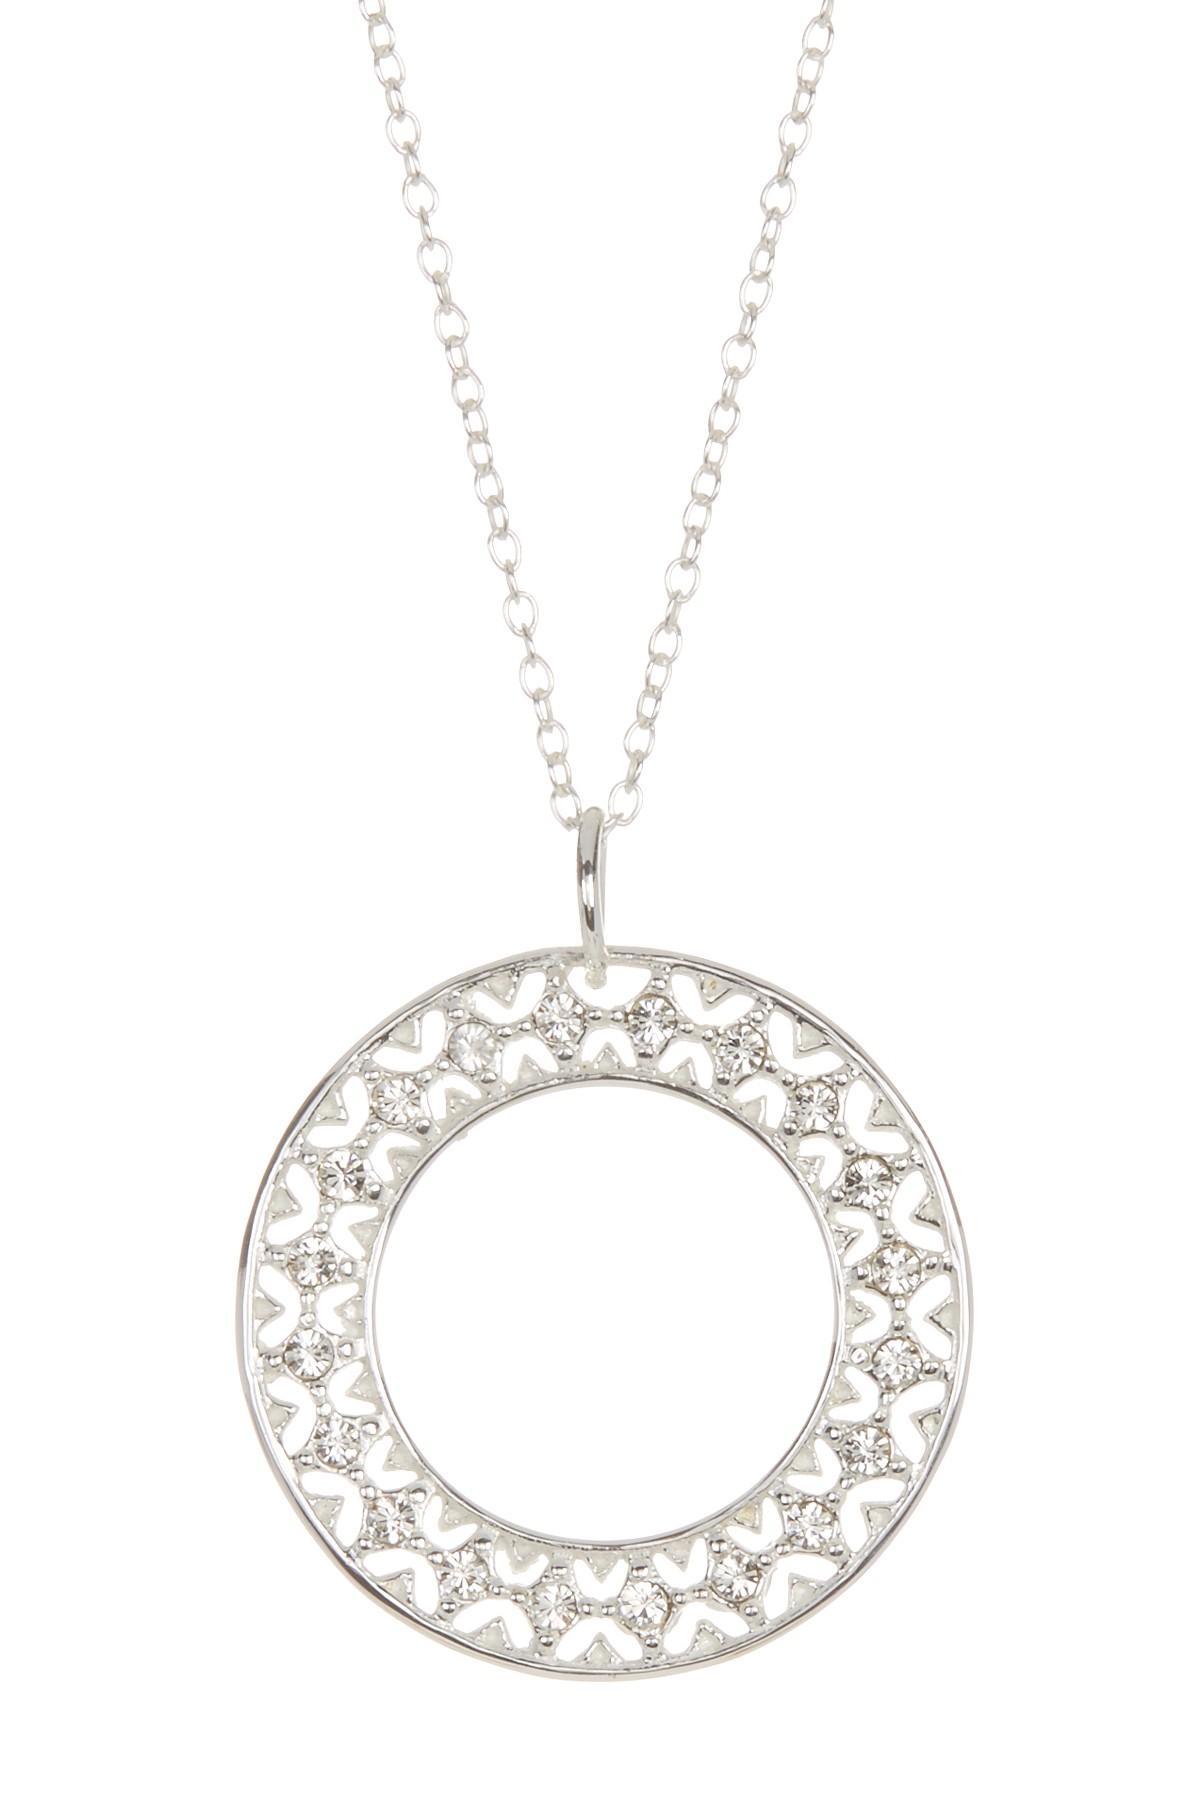 Argento vivo Sterling Silver Filigree Cz Pendant Necklace